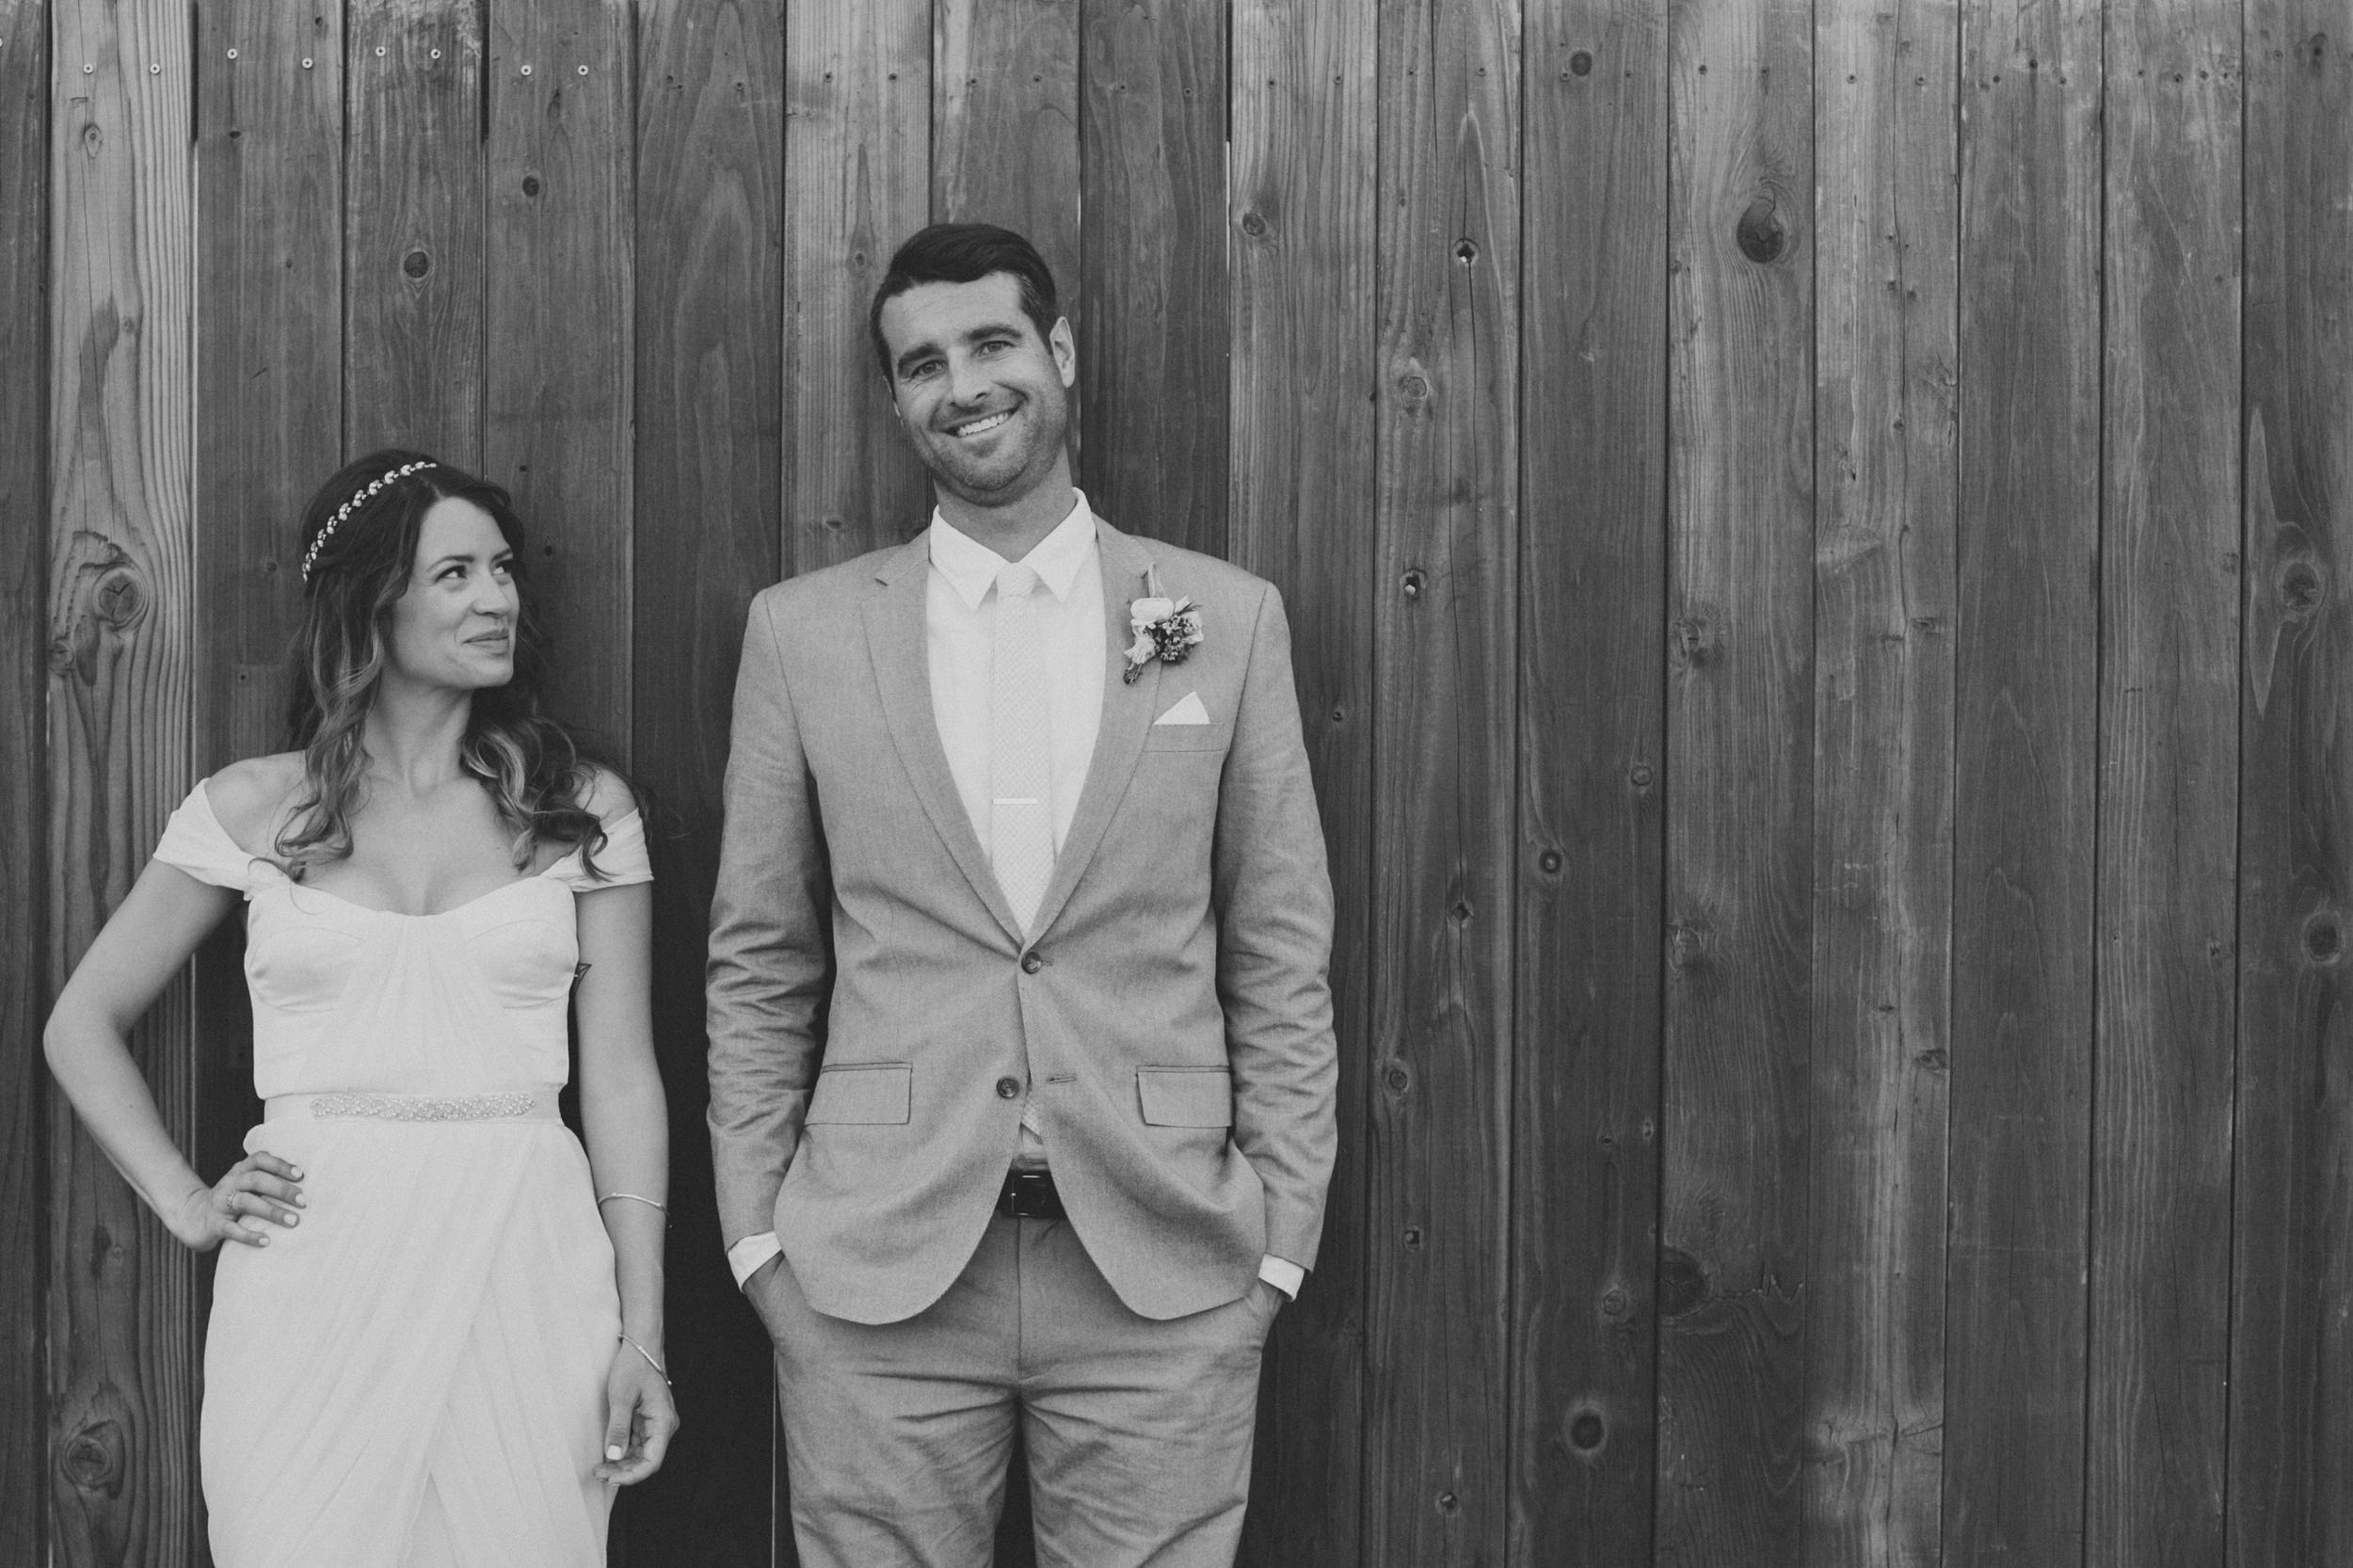 bride in winifred bean tulipe dress, groom in grey suit